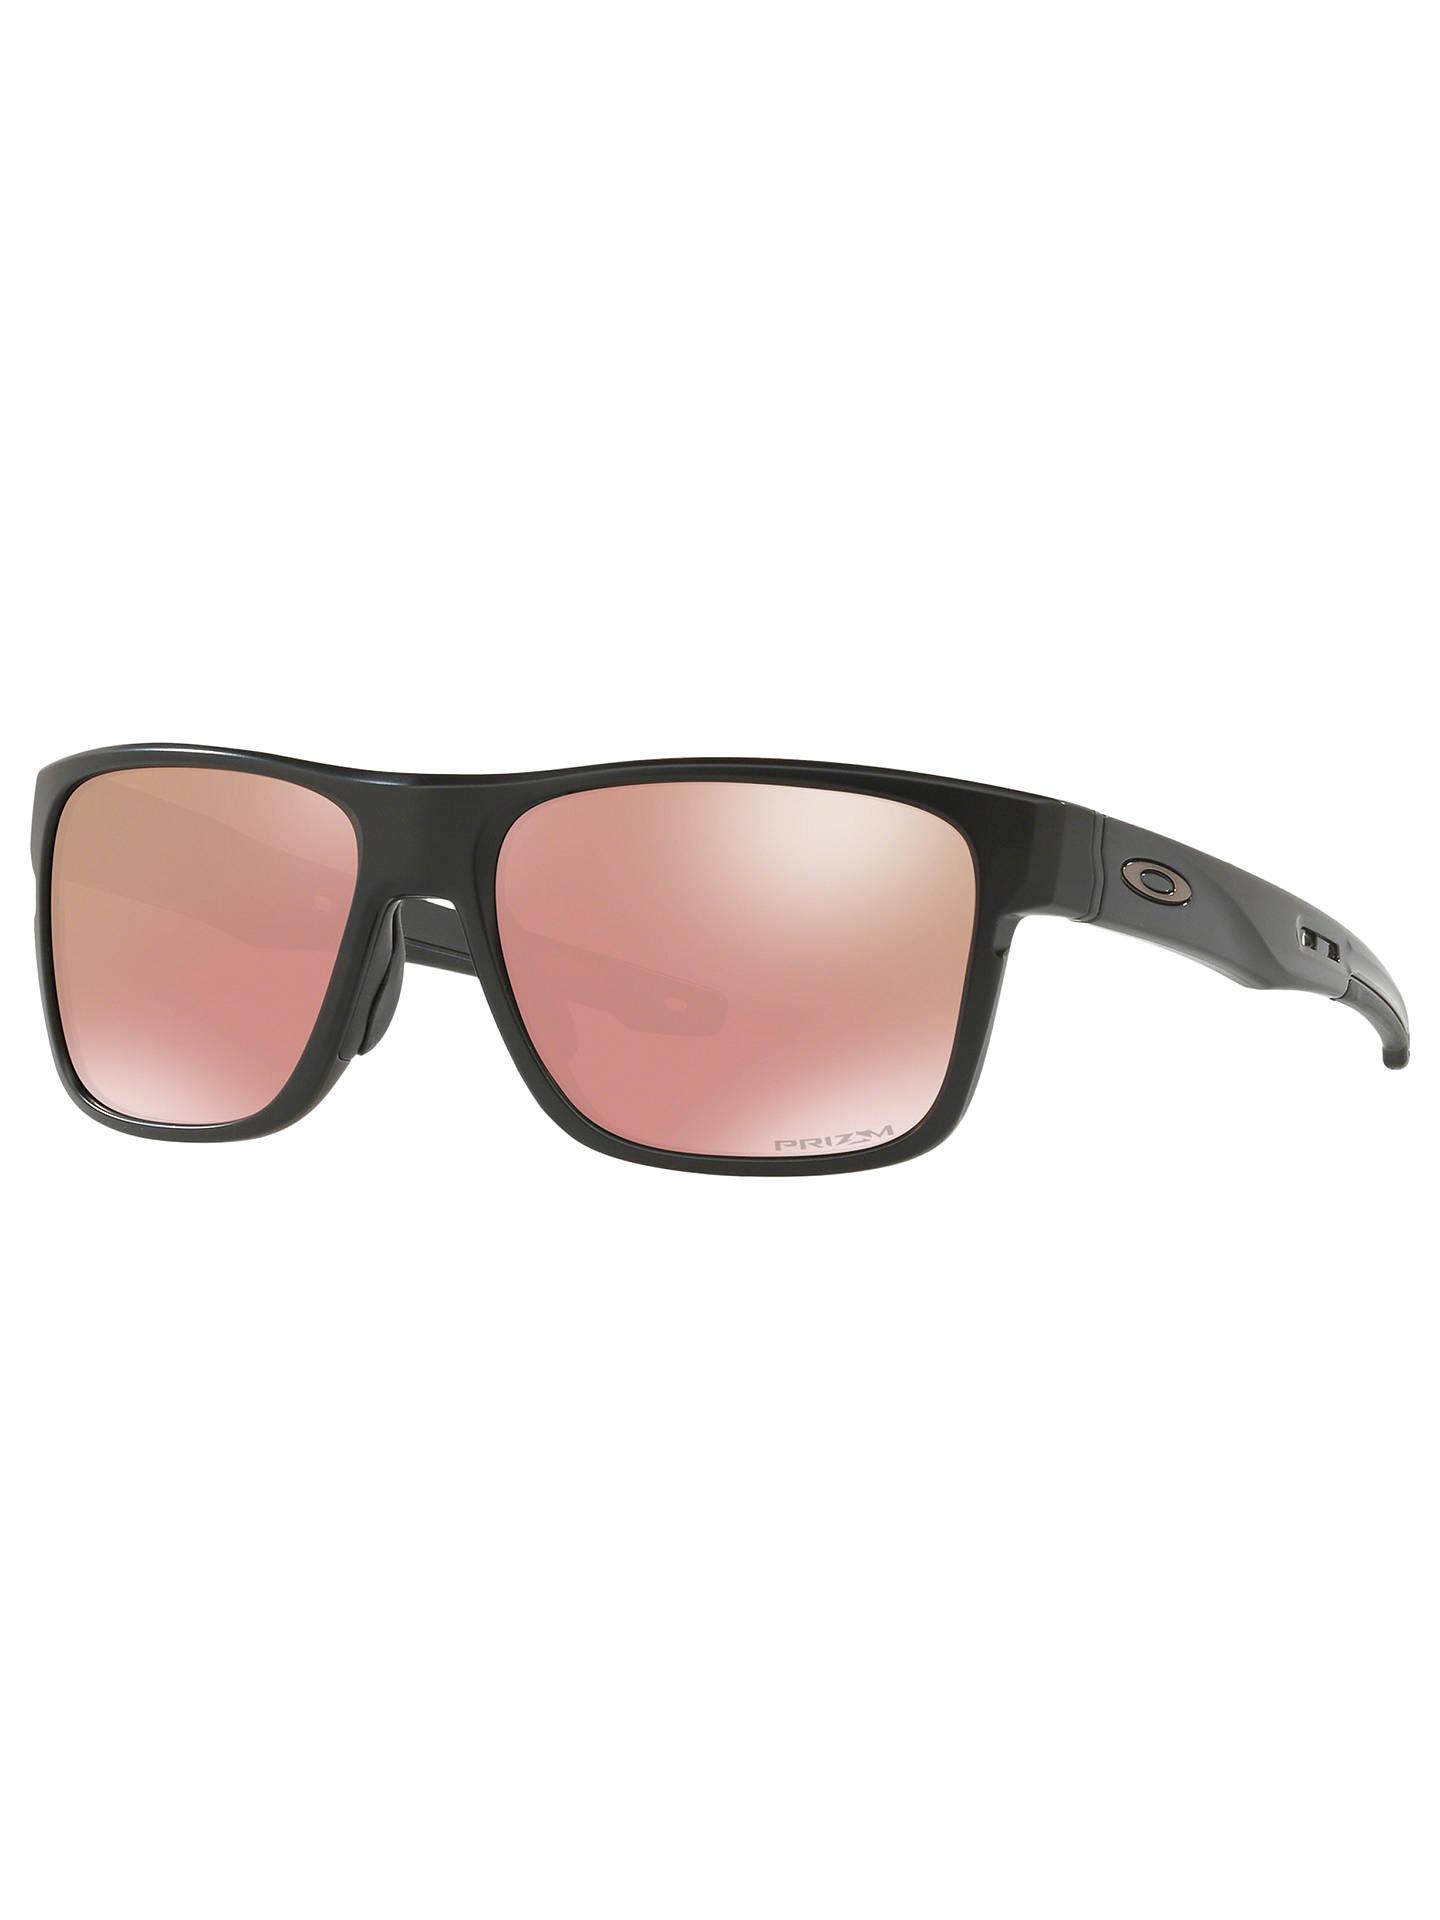 af77472122 BuyOakley OO9361 Men s Crossrange Prizm Square Sunglasses